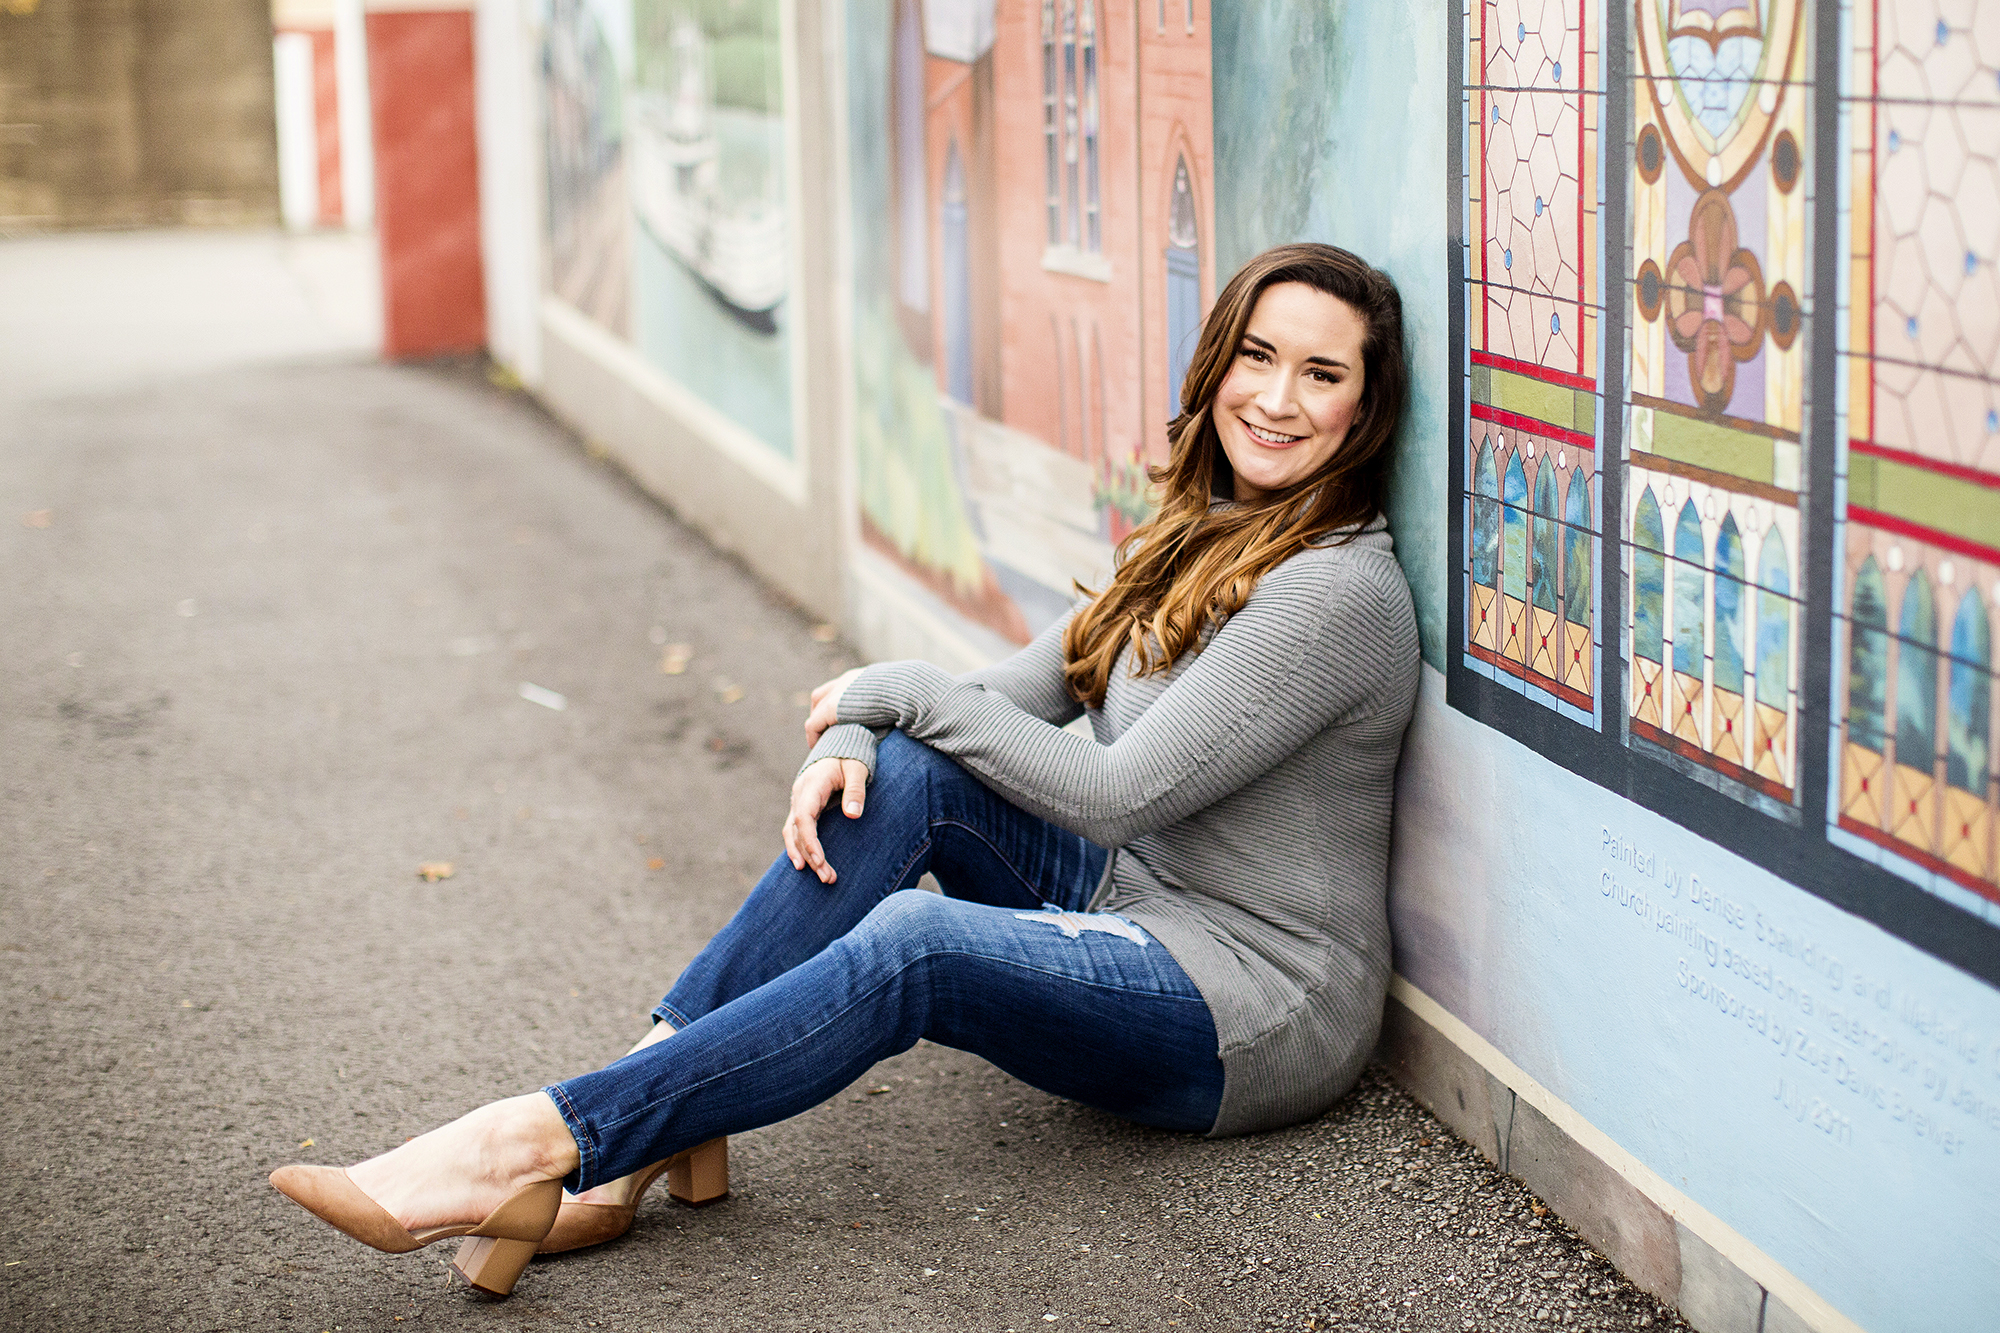 Seriously_Sabrina_Photography_Ashland_Kentucky_Fashion_Blogger_Portraits_LaurenFannin22.jpg